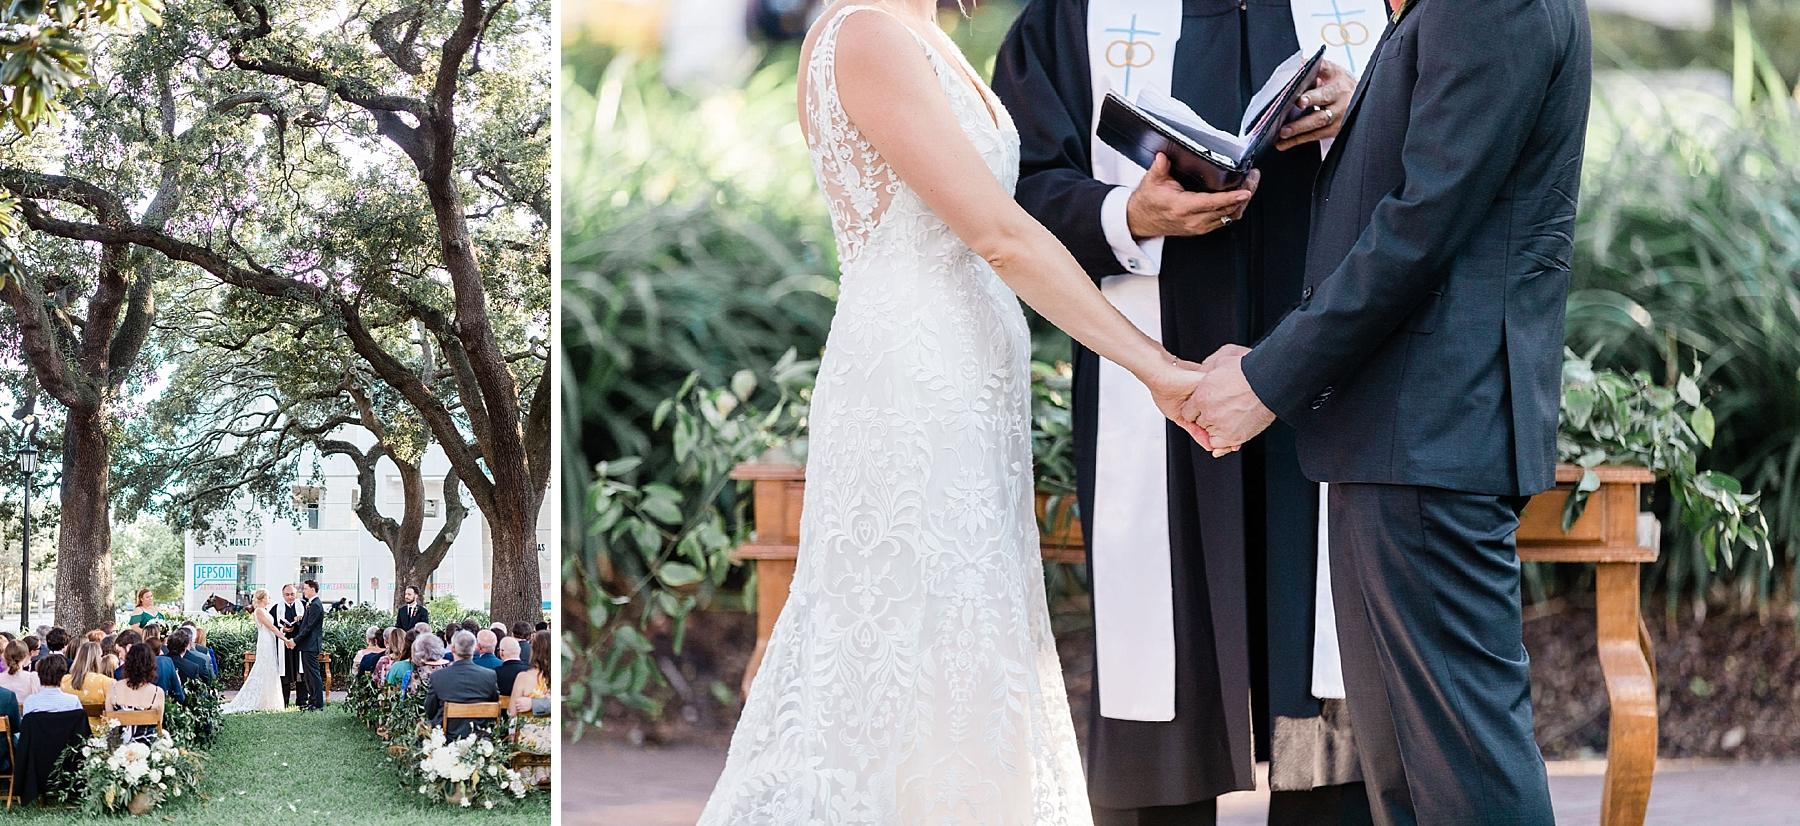 Cara + Matt's Telfair Square Wedding – Apt. B Photography   Savannah Wedding Photographer